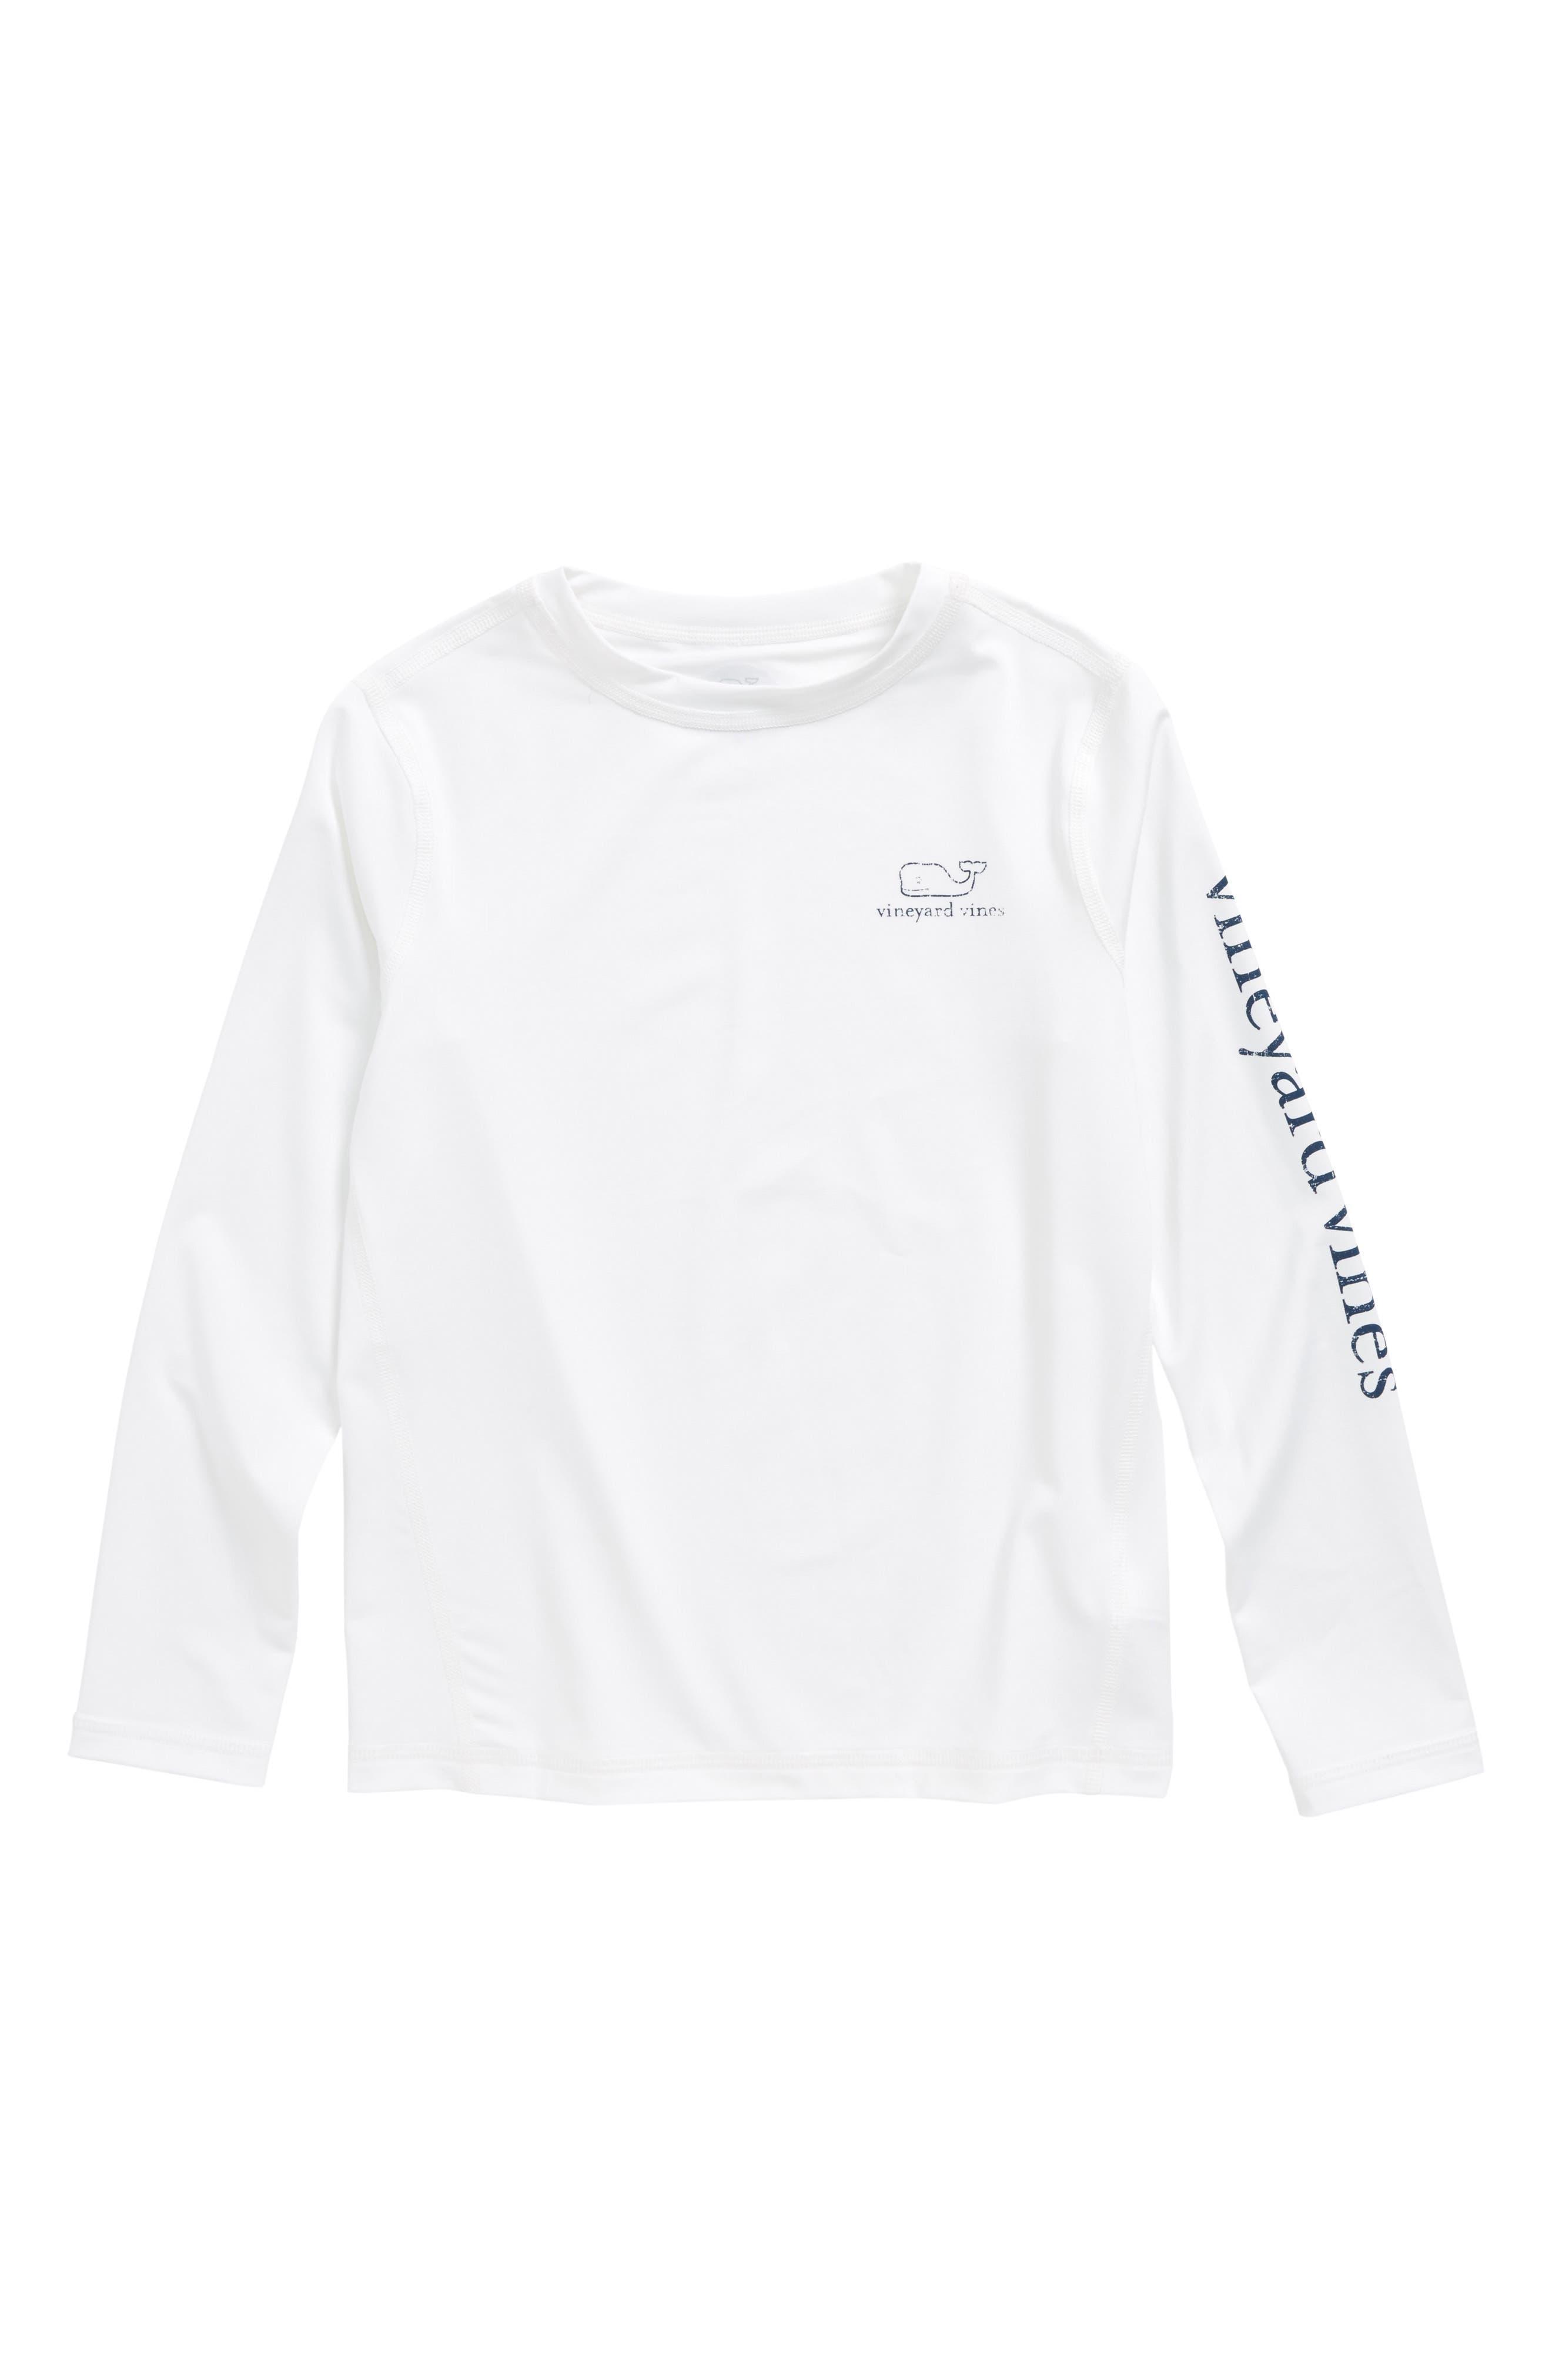 Long Sleeve Rashguard Top,                         Main,                         color, White Cap